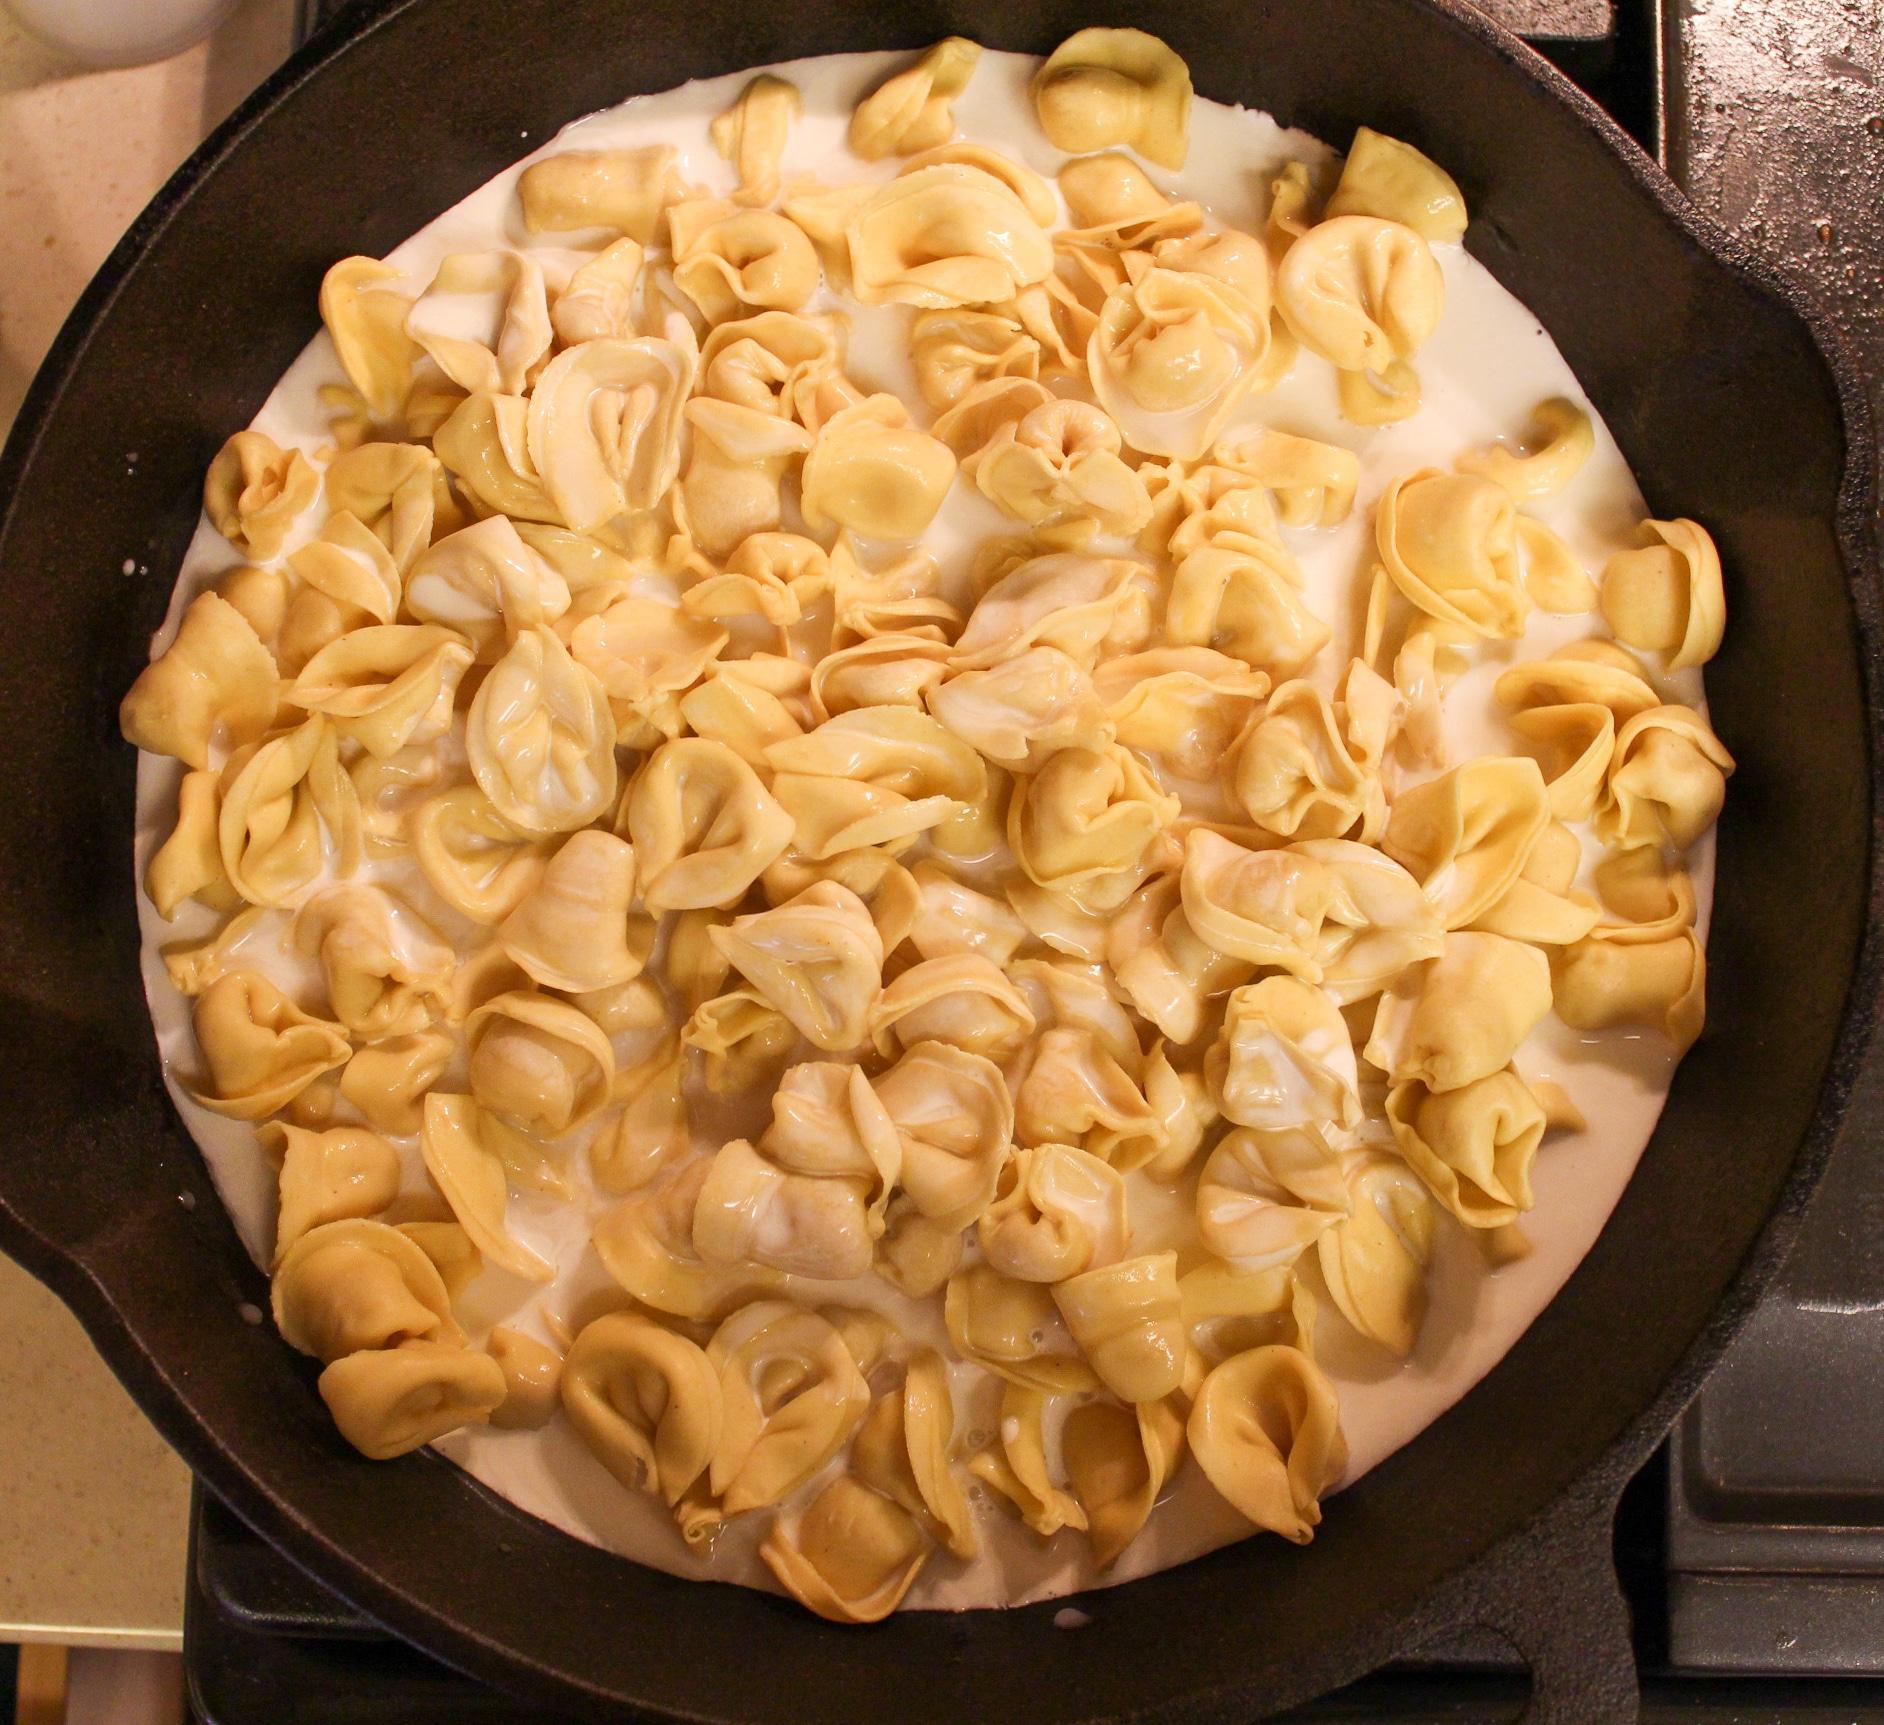 pasta in skillet with milk